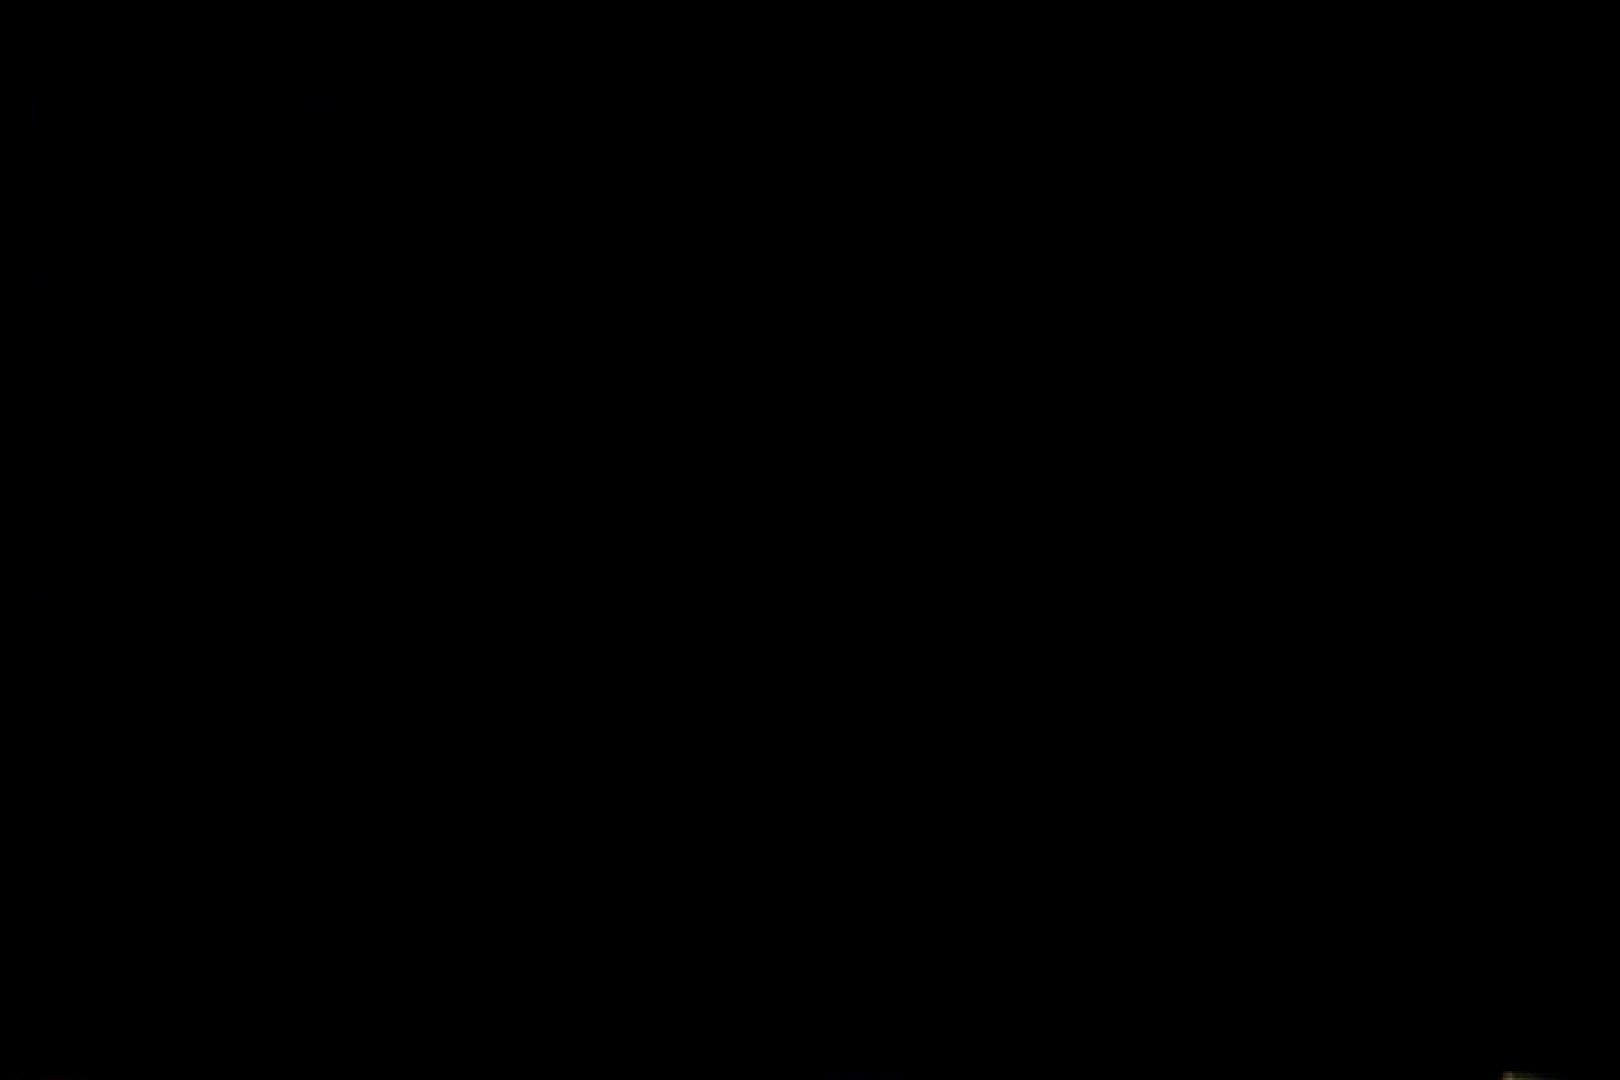 充血監督の深夜の運動会Vol.150 0 | 0  41連発 36